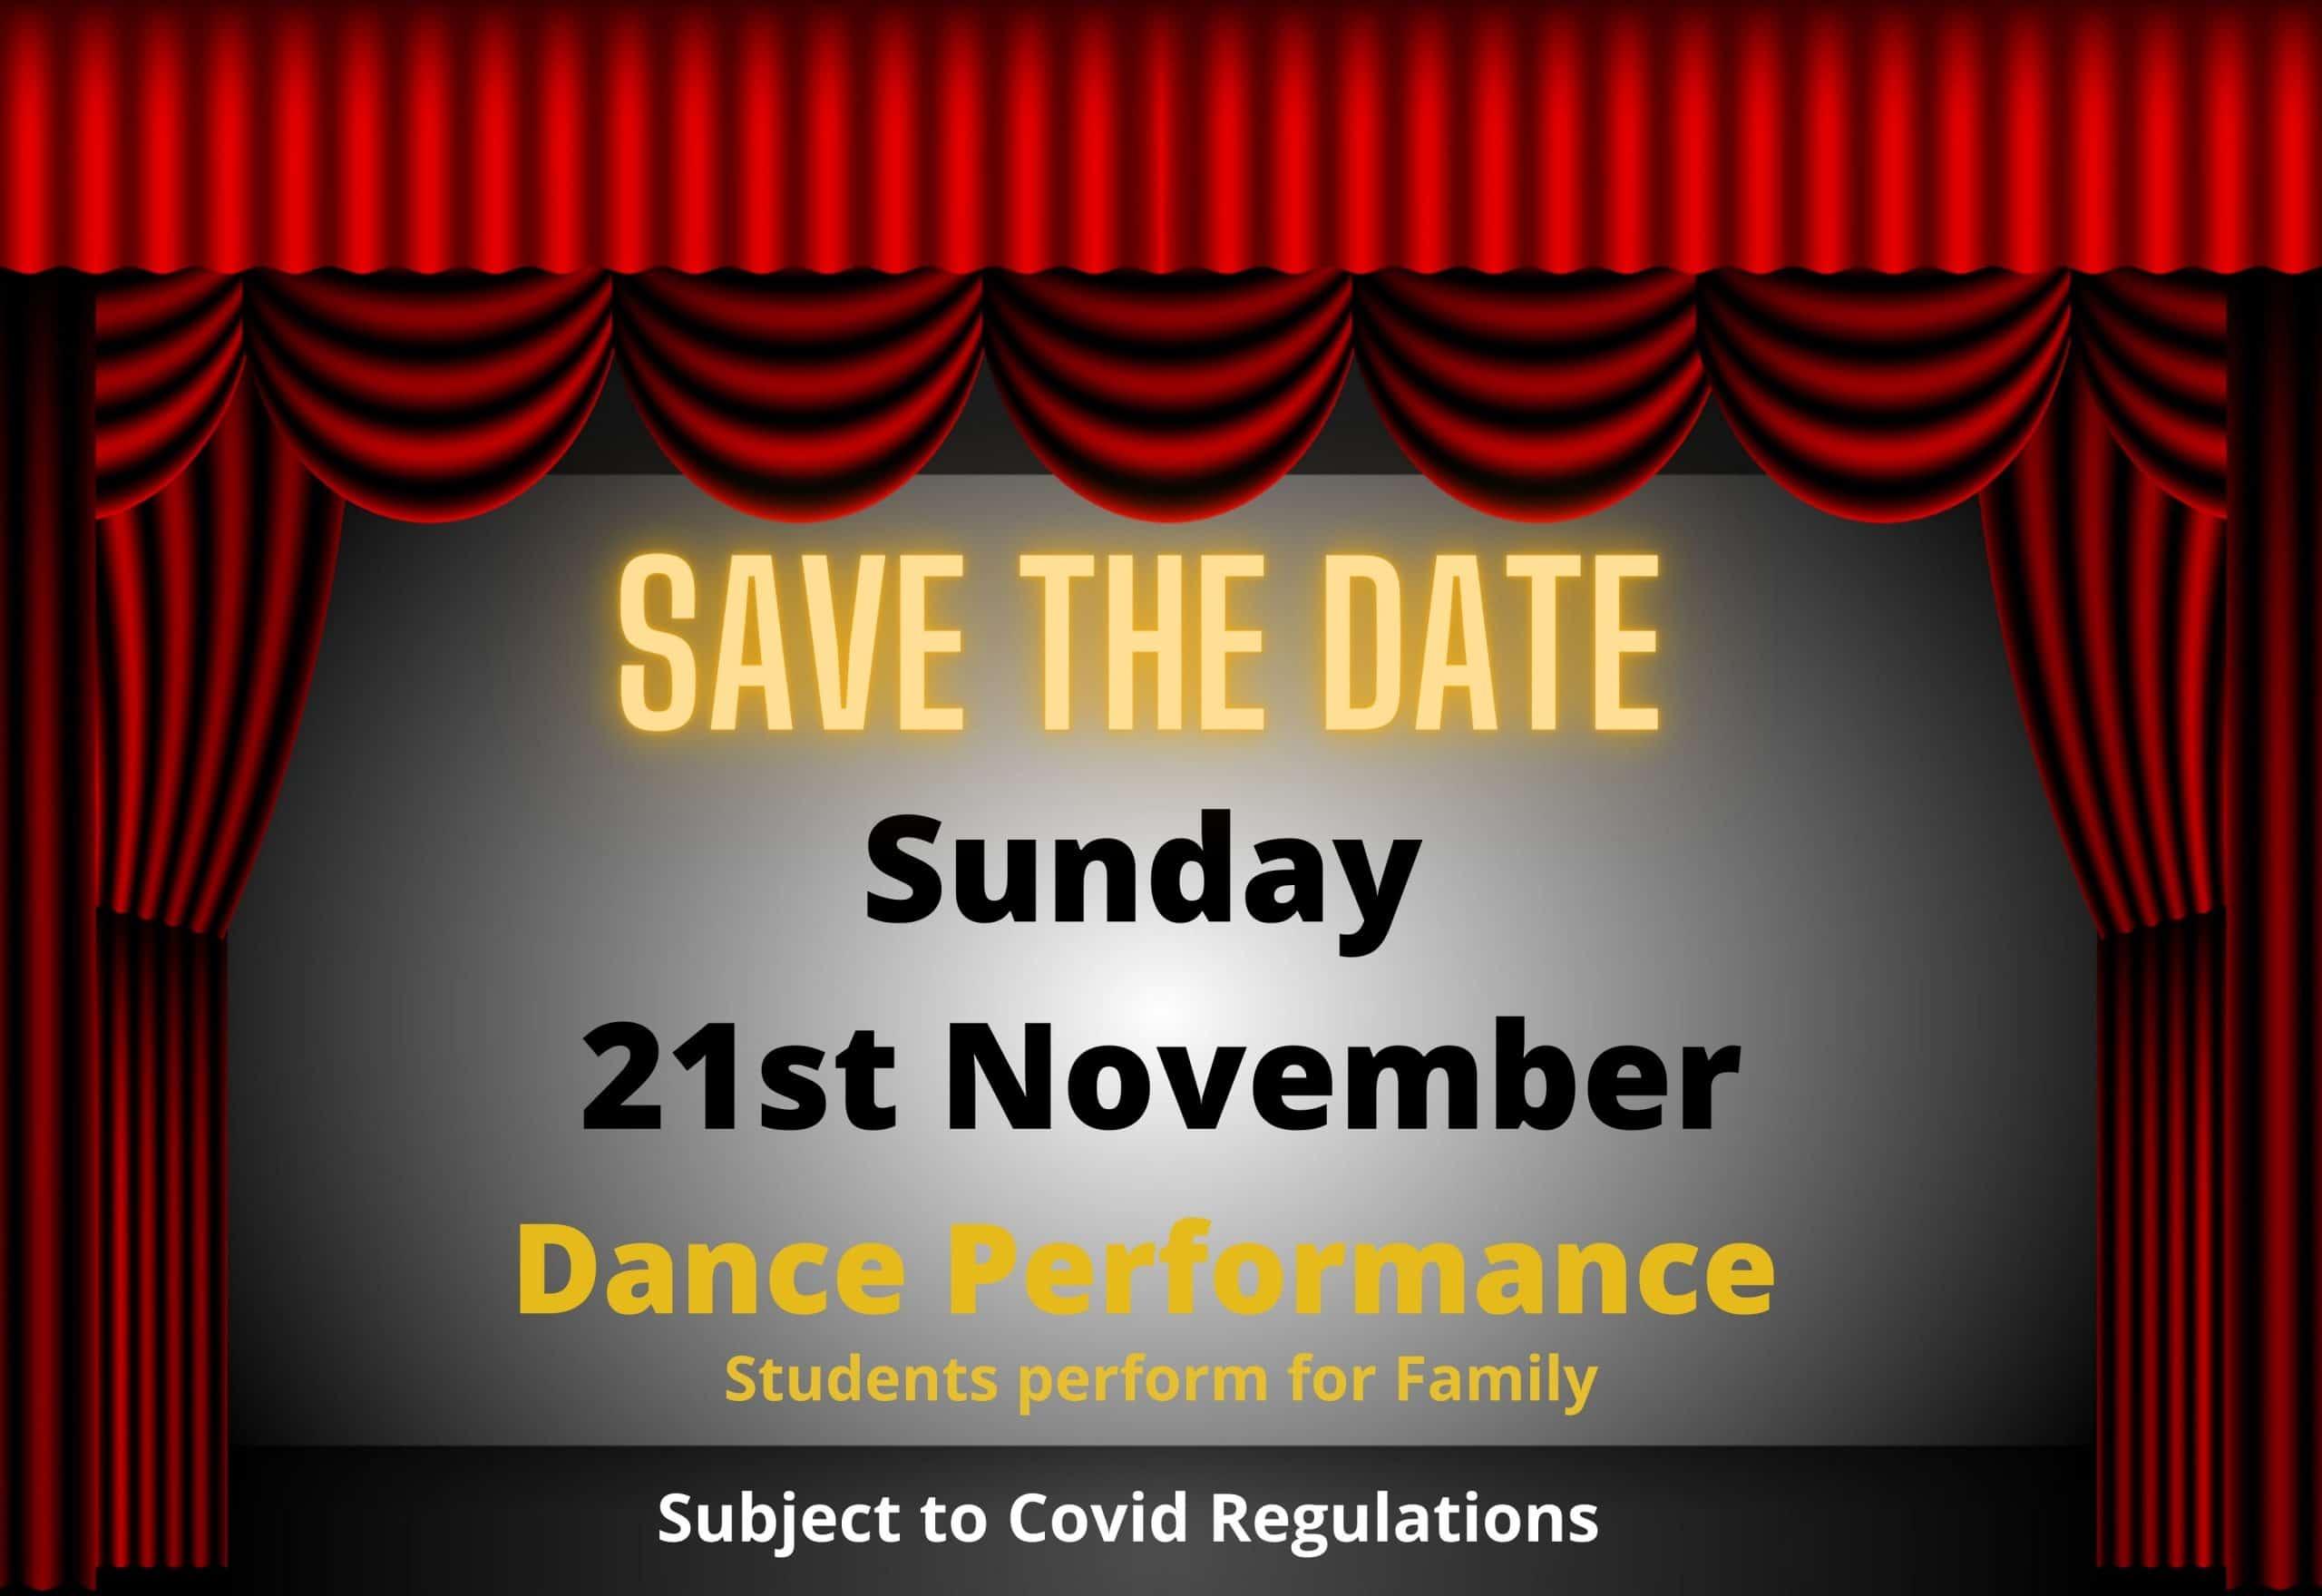 Childrens Dance performance Date Sandyford